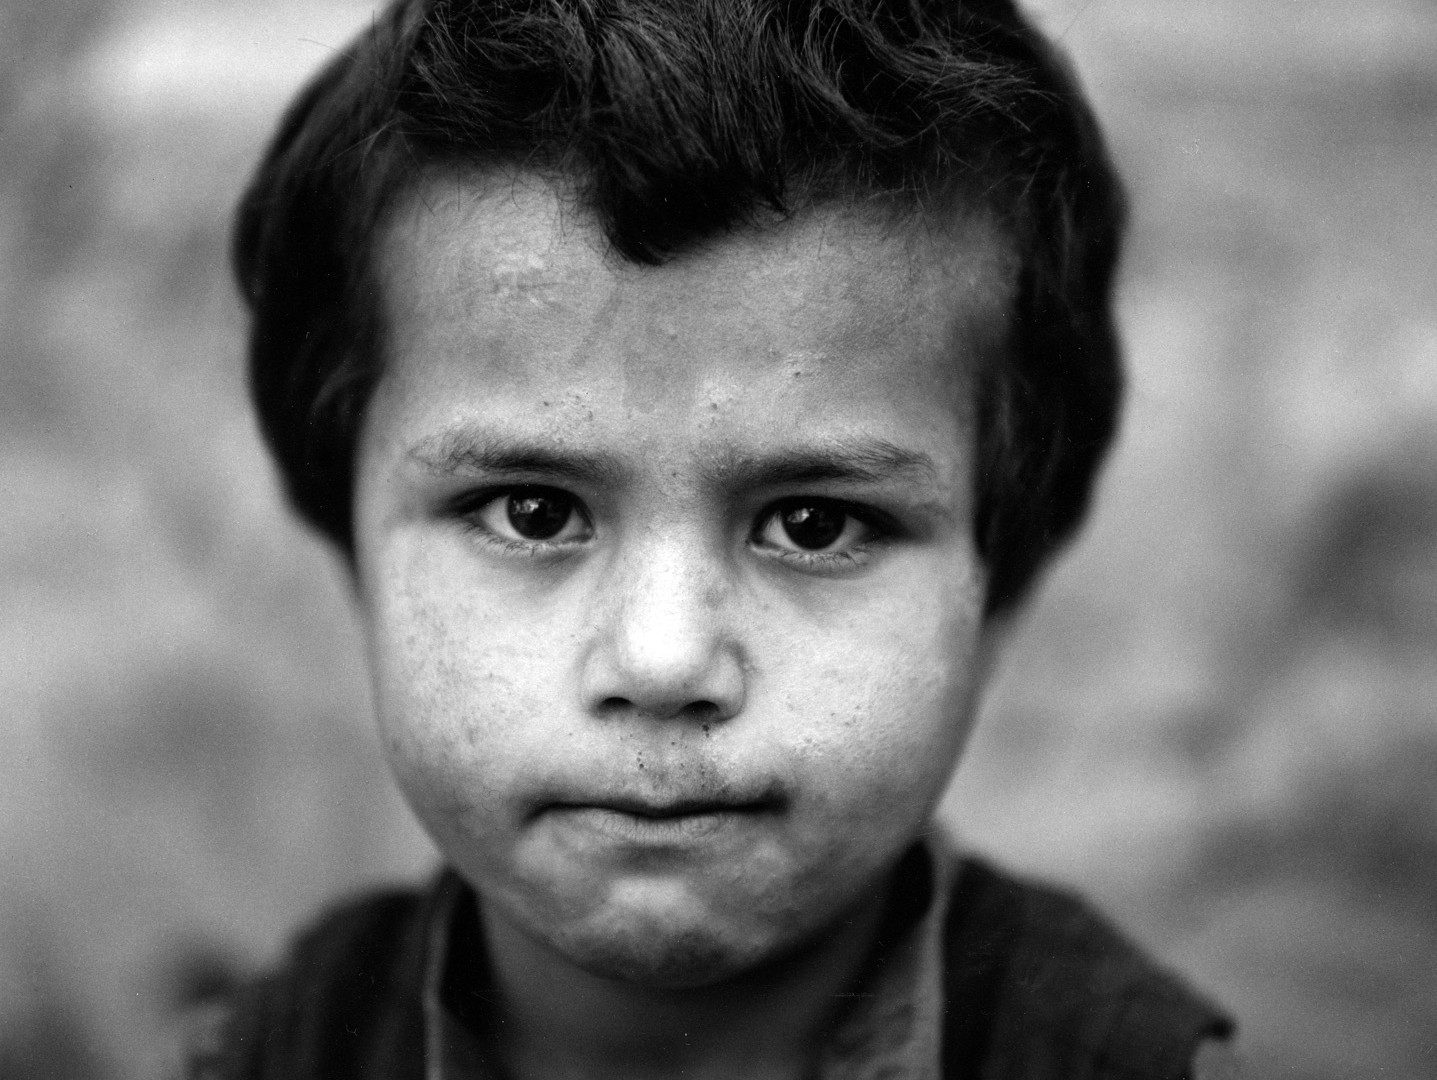 Fazal Sheikh, Afghan child born in exile, Northern Pakistan, 1997